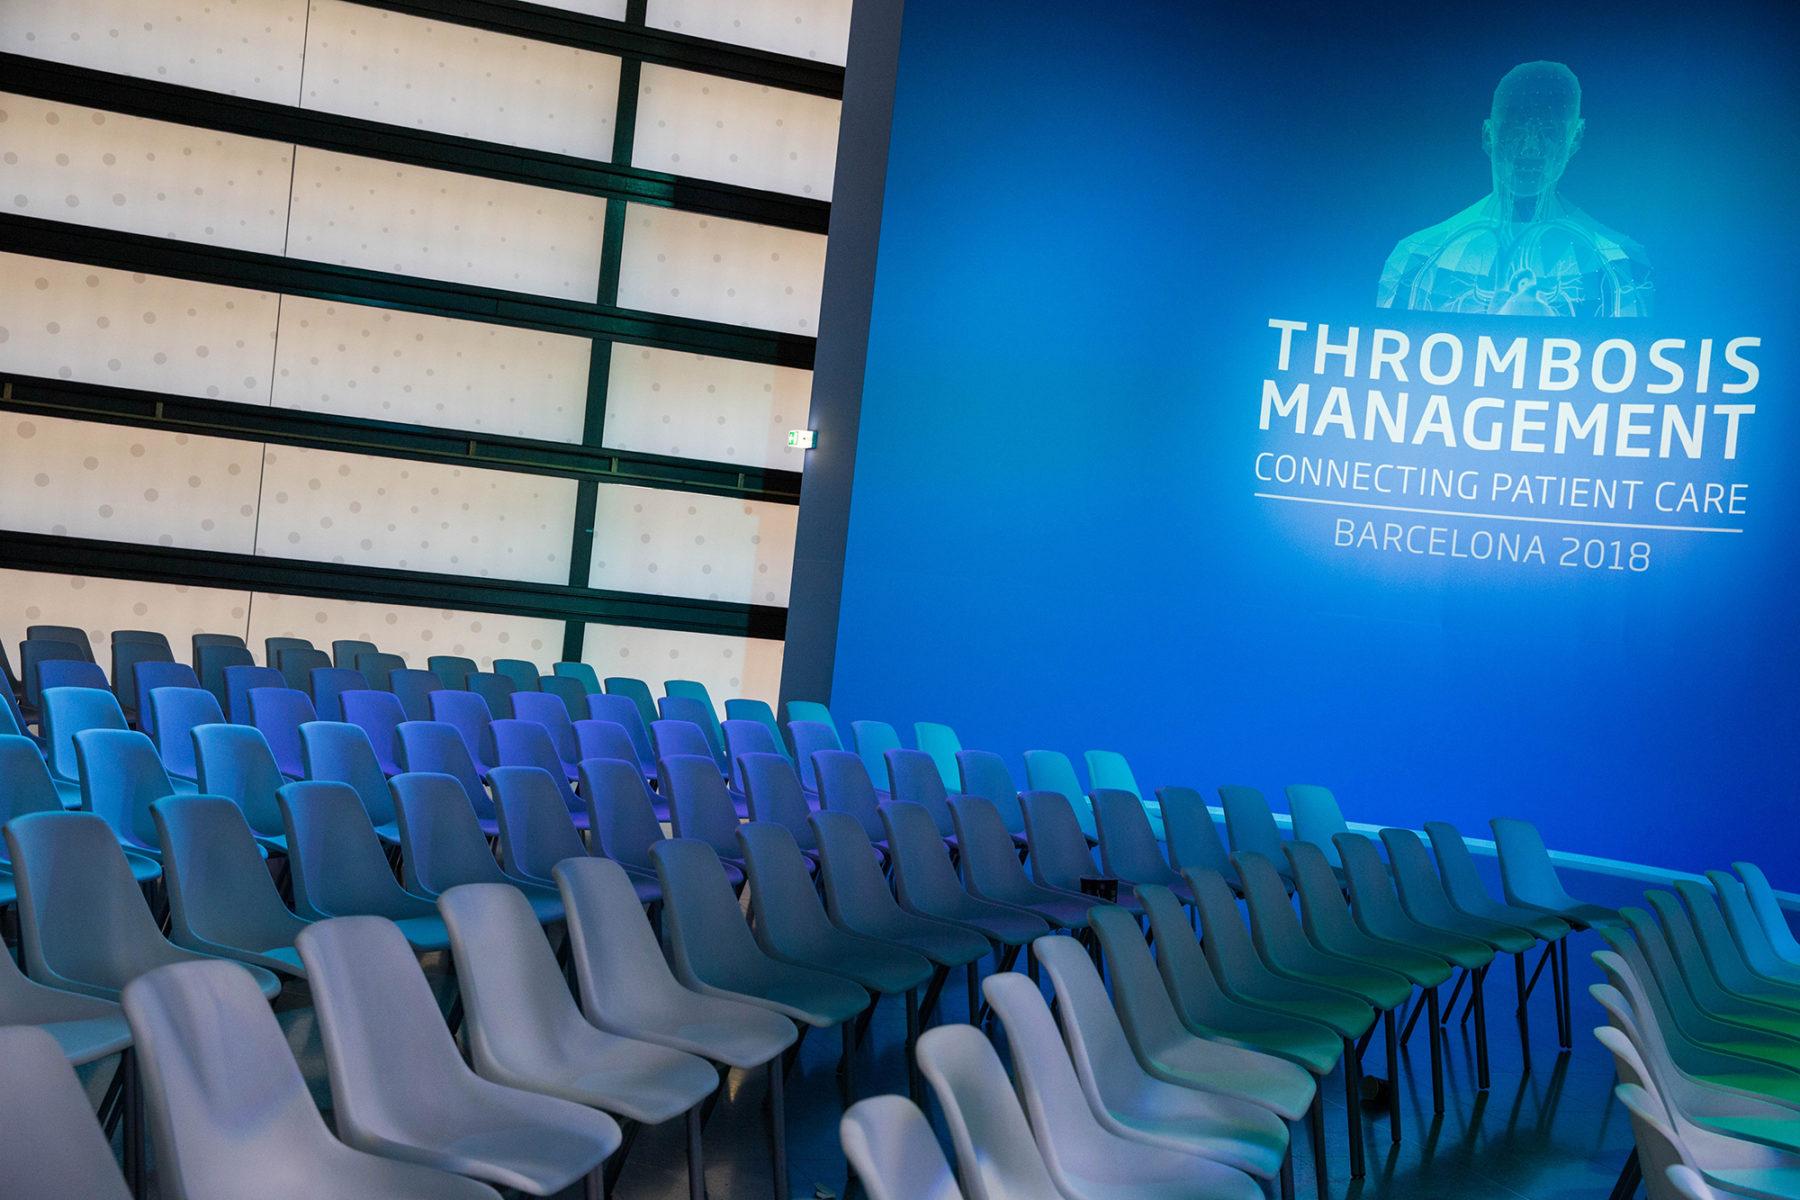 thrombosis management | palau de congressos de catalunya | @sundisa_impresion